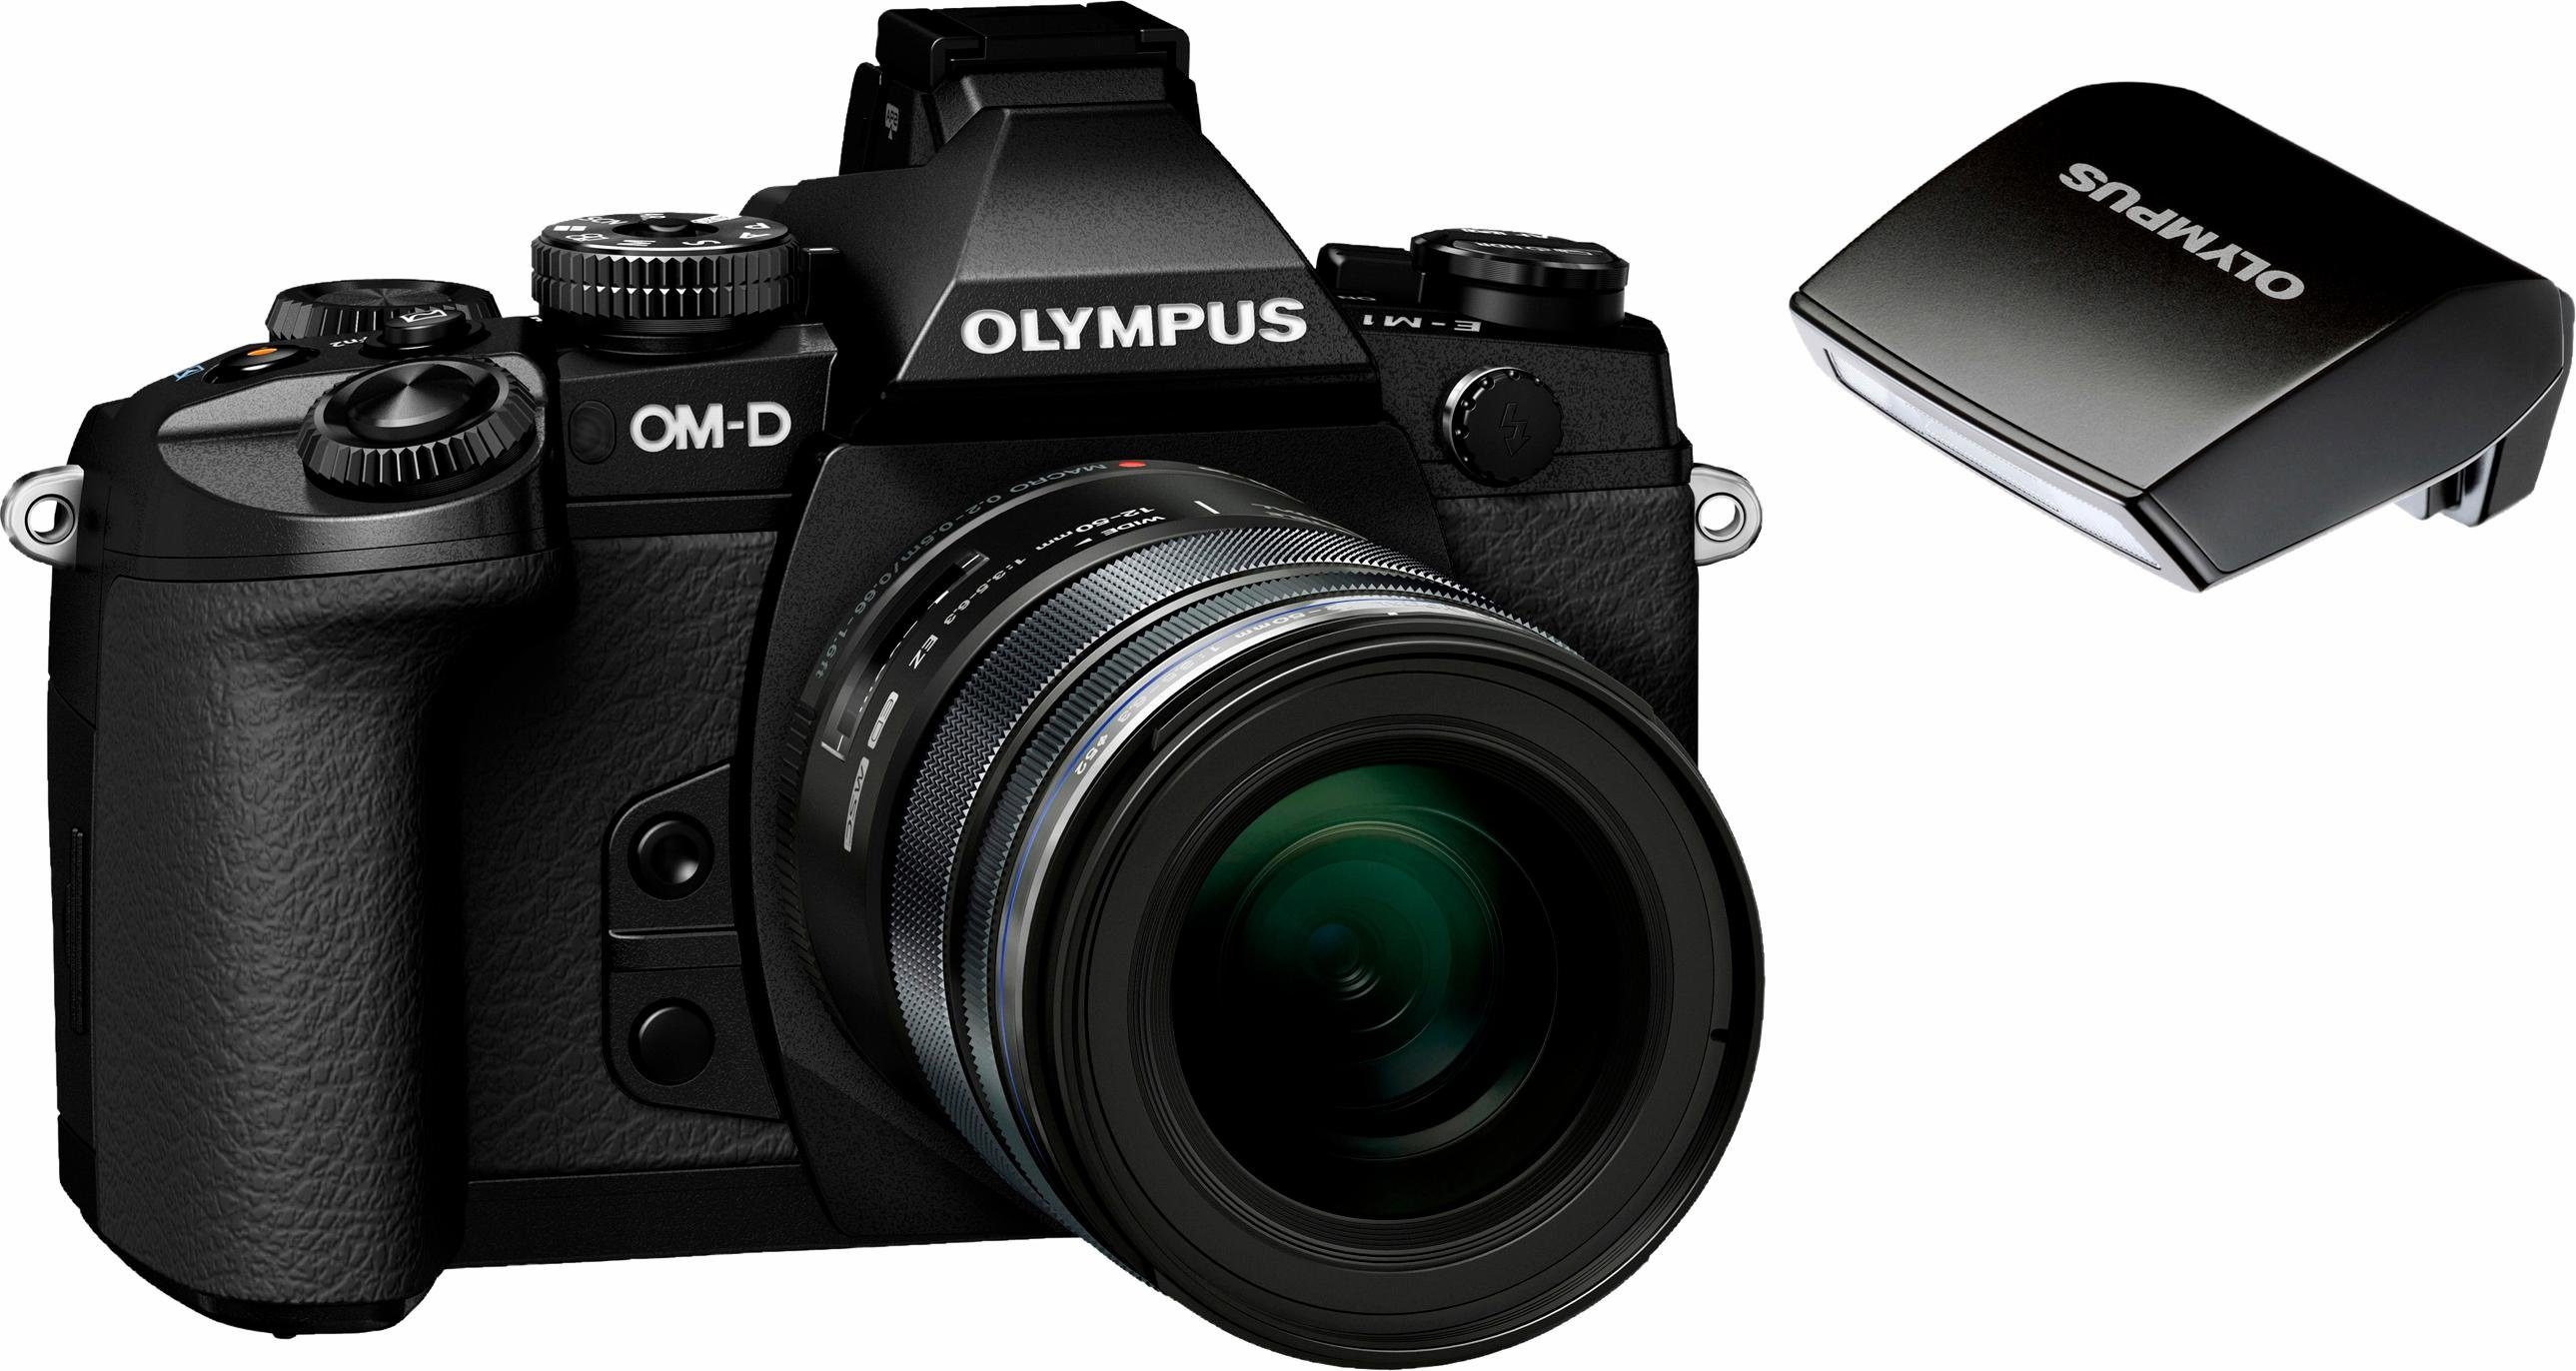 Olympus OM-D E-M1 System Kamera, M.ZUIKO DIGITAL ED 12-50 1:3.5-6.3 EZ Telezoom, 16,3 Megapixel